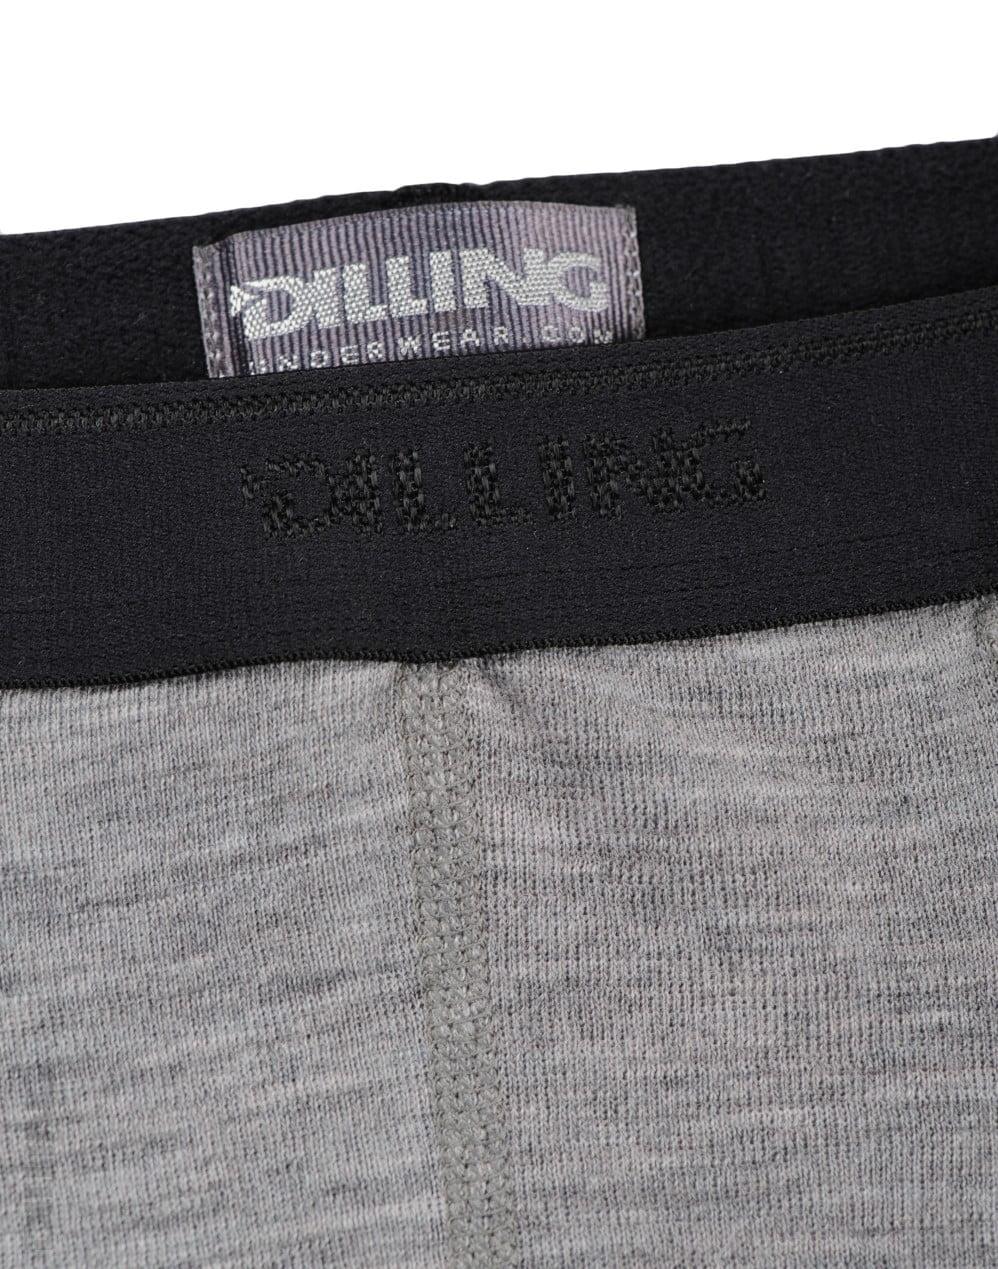 Boxeri gri din lana merinos organica pentru barbati Dilling 5